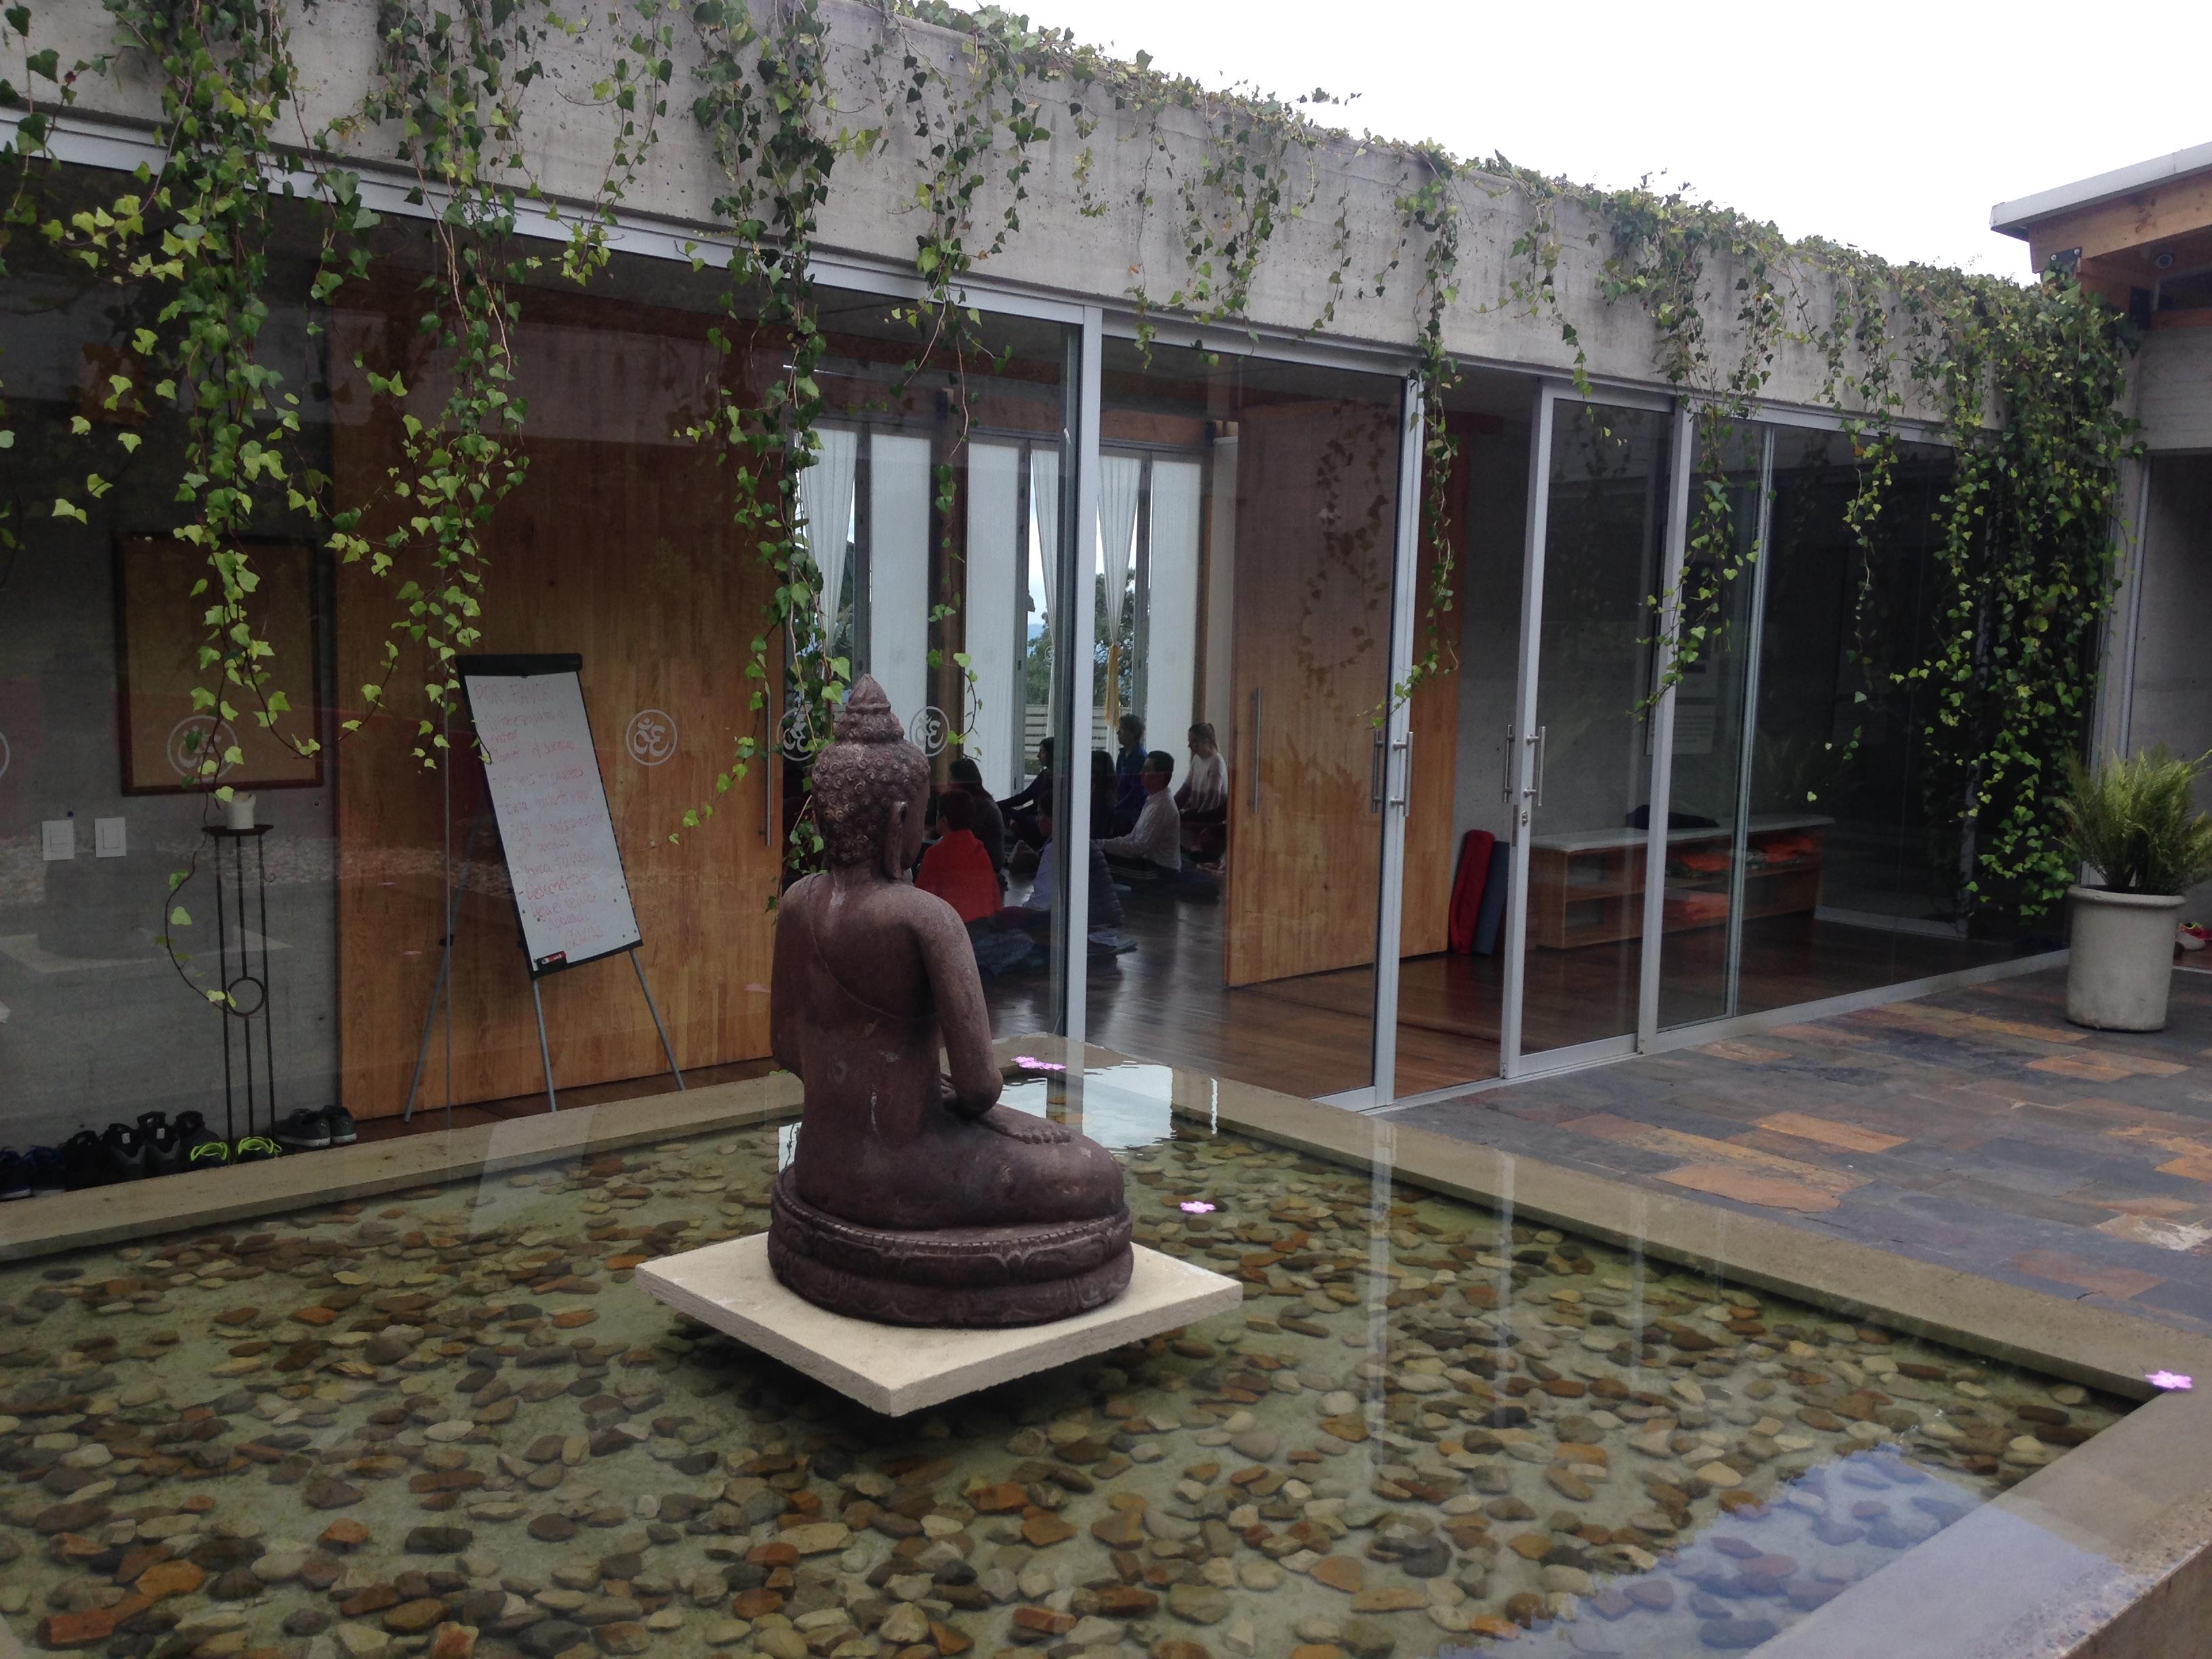 Día completo de práctica Mindfulness